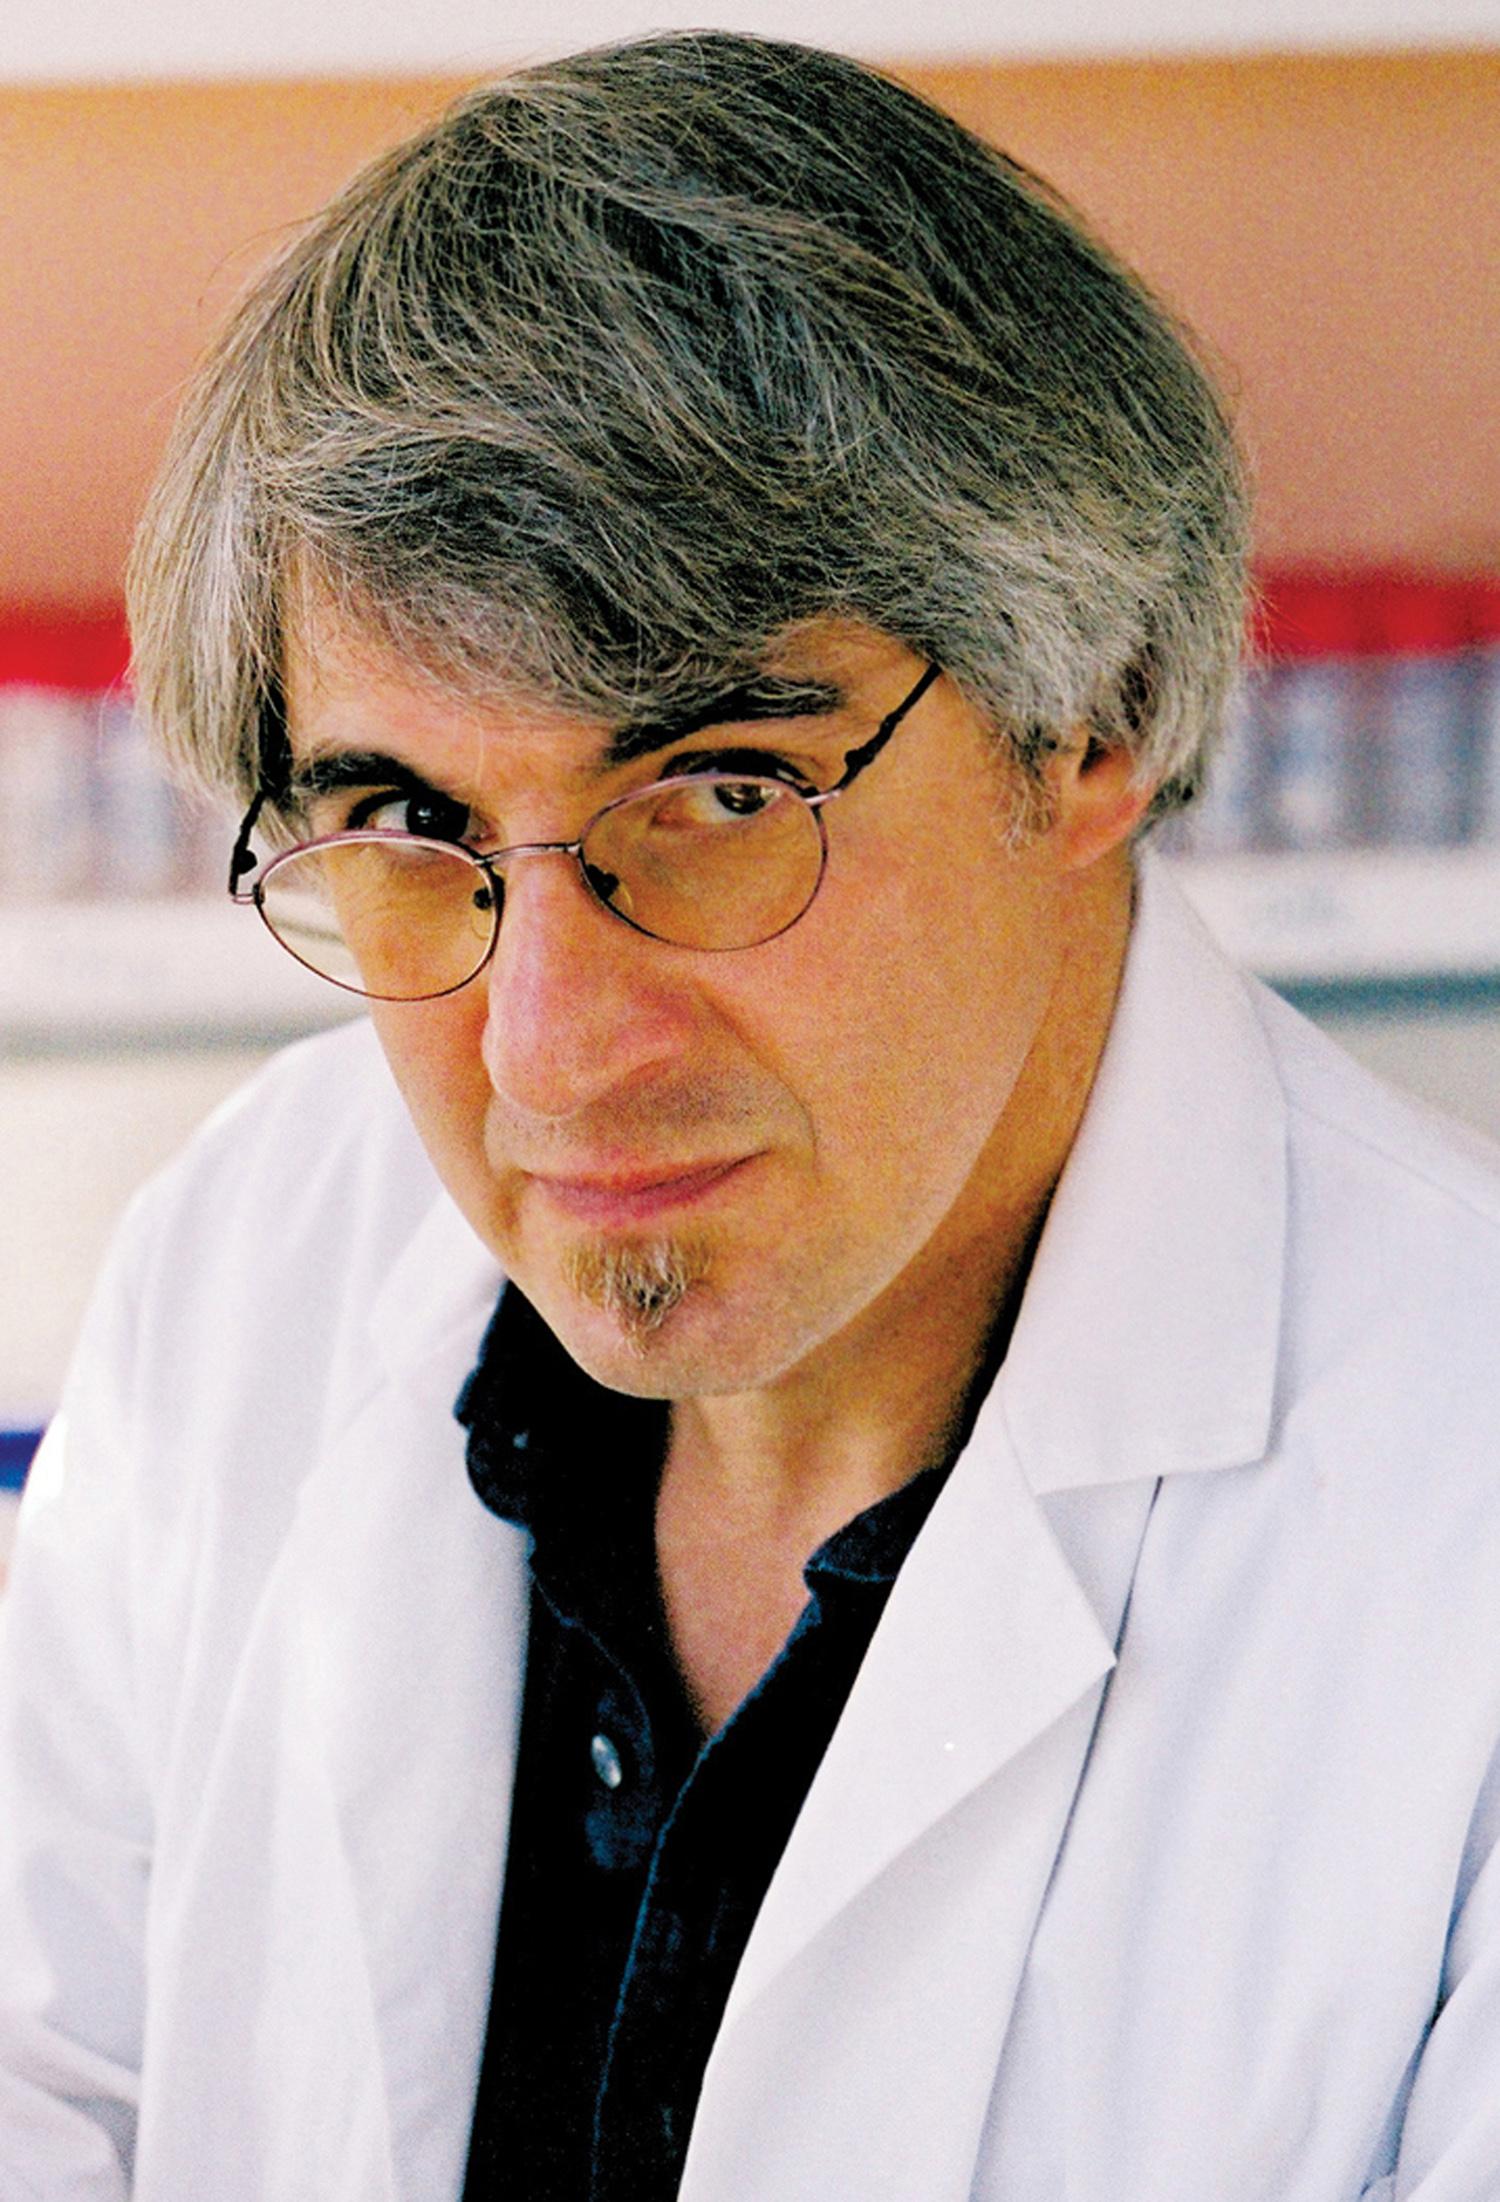 Sean Tavtigian, Ph.D., a Huntsman Cancer Institute (HCI) investigator and associate professor in the Department of Oncological Sciences at the University of Utah.